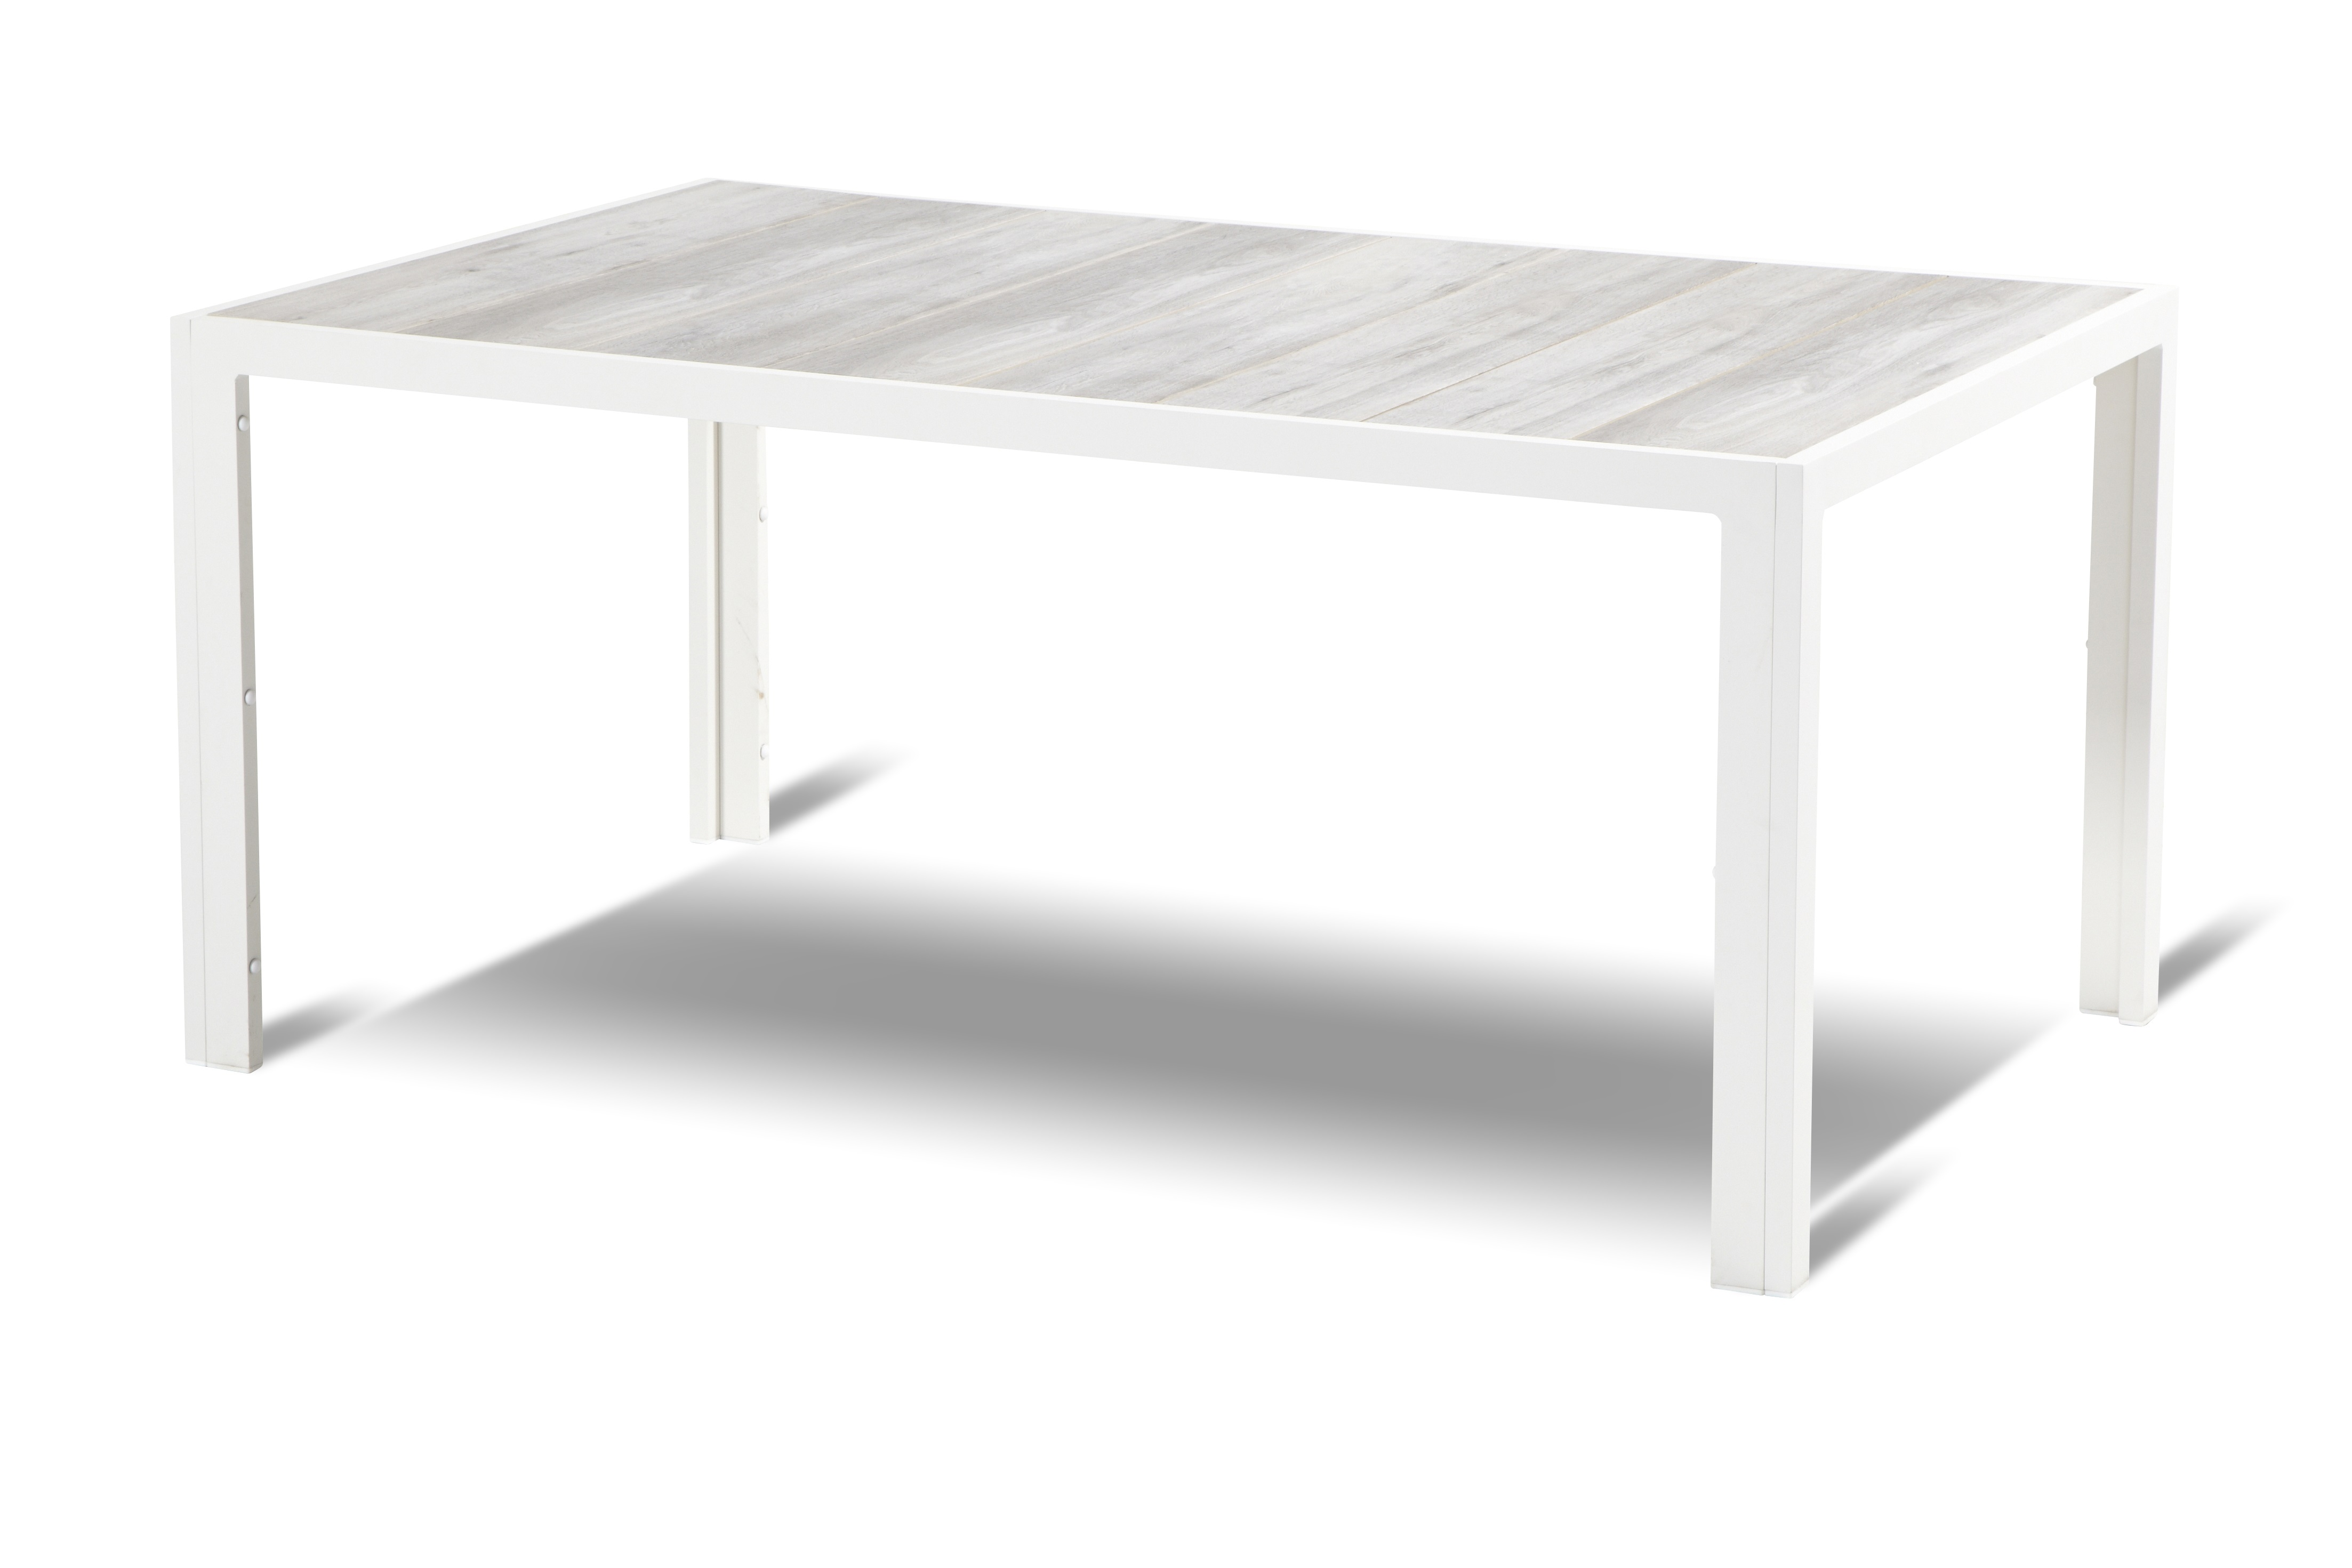 Hartman ® Tanger Ceramic Table Large